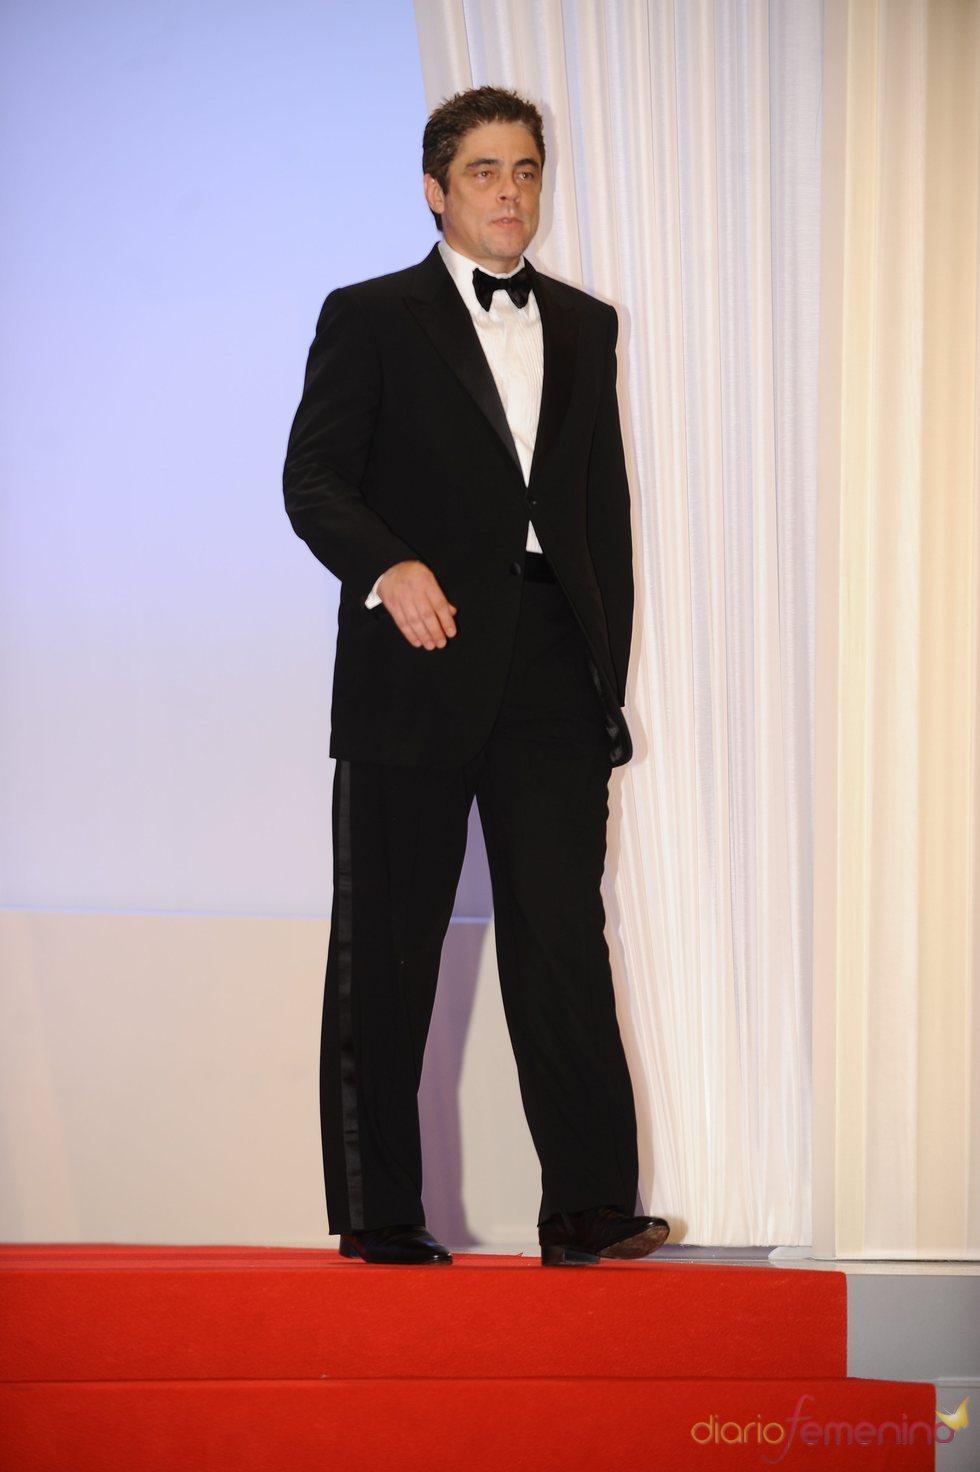 Benicio del Toro, miembro del jurado del Festival de Cannes